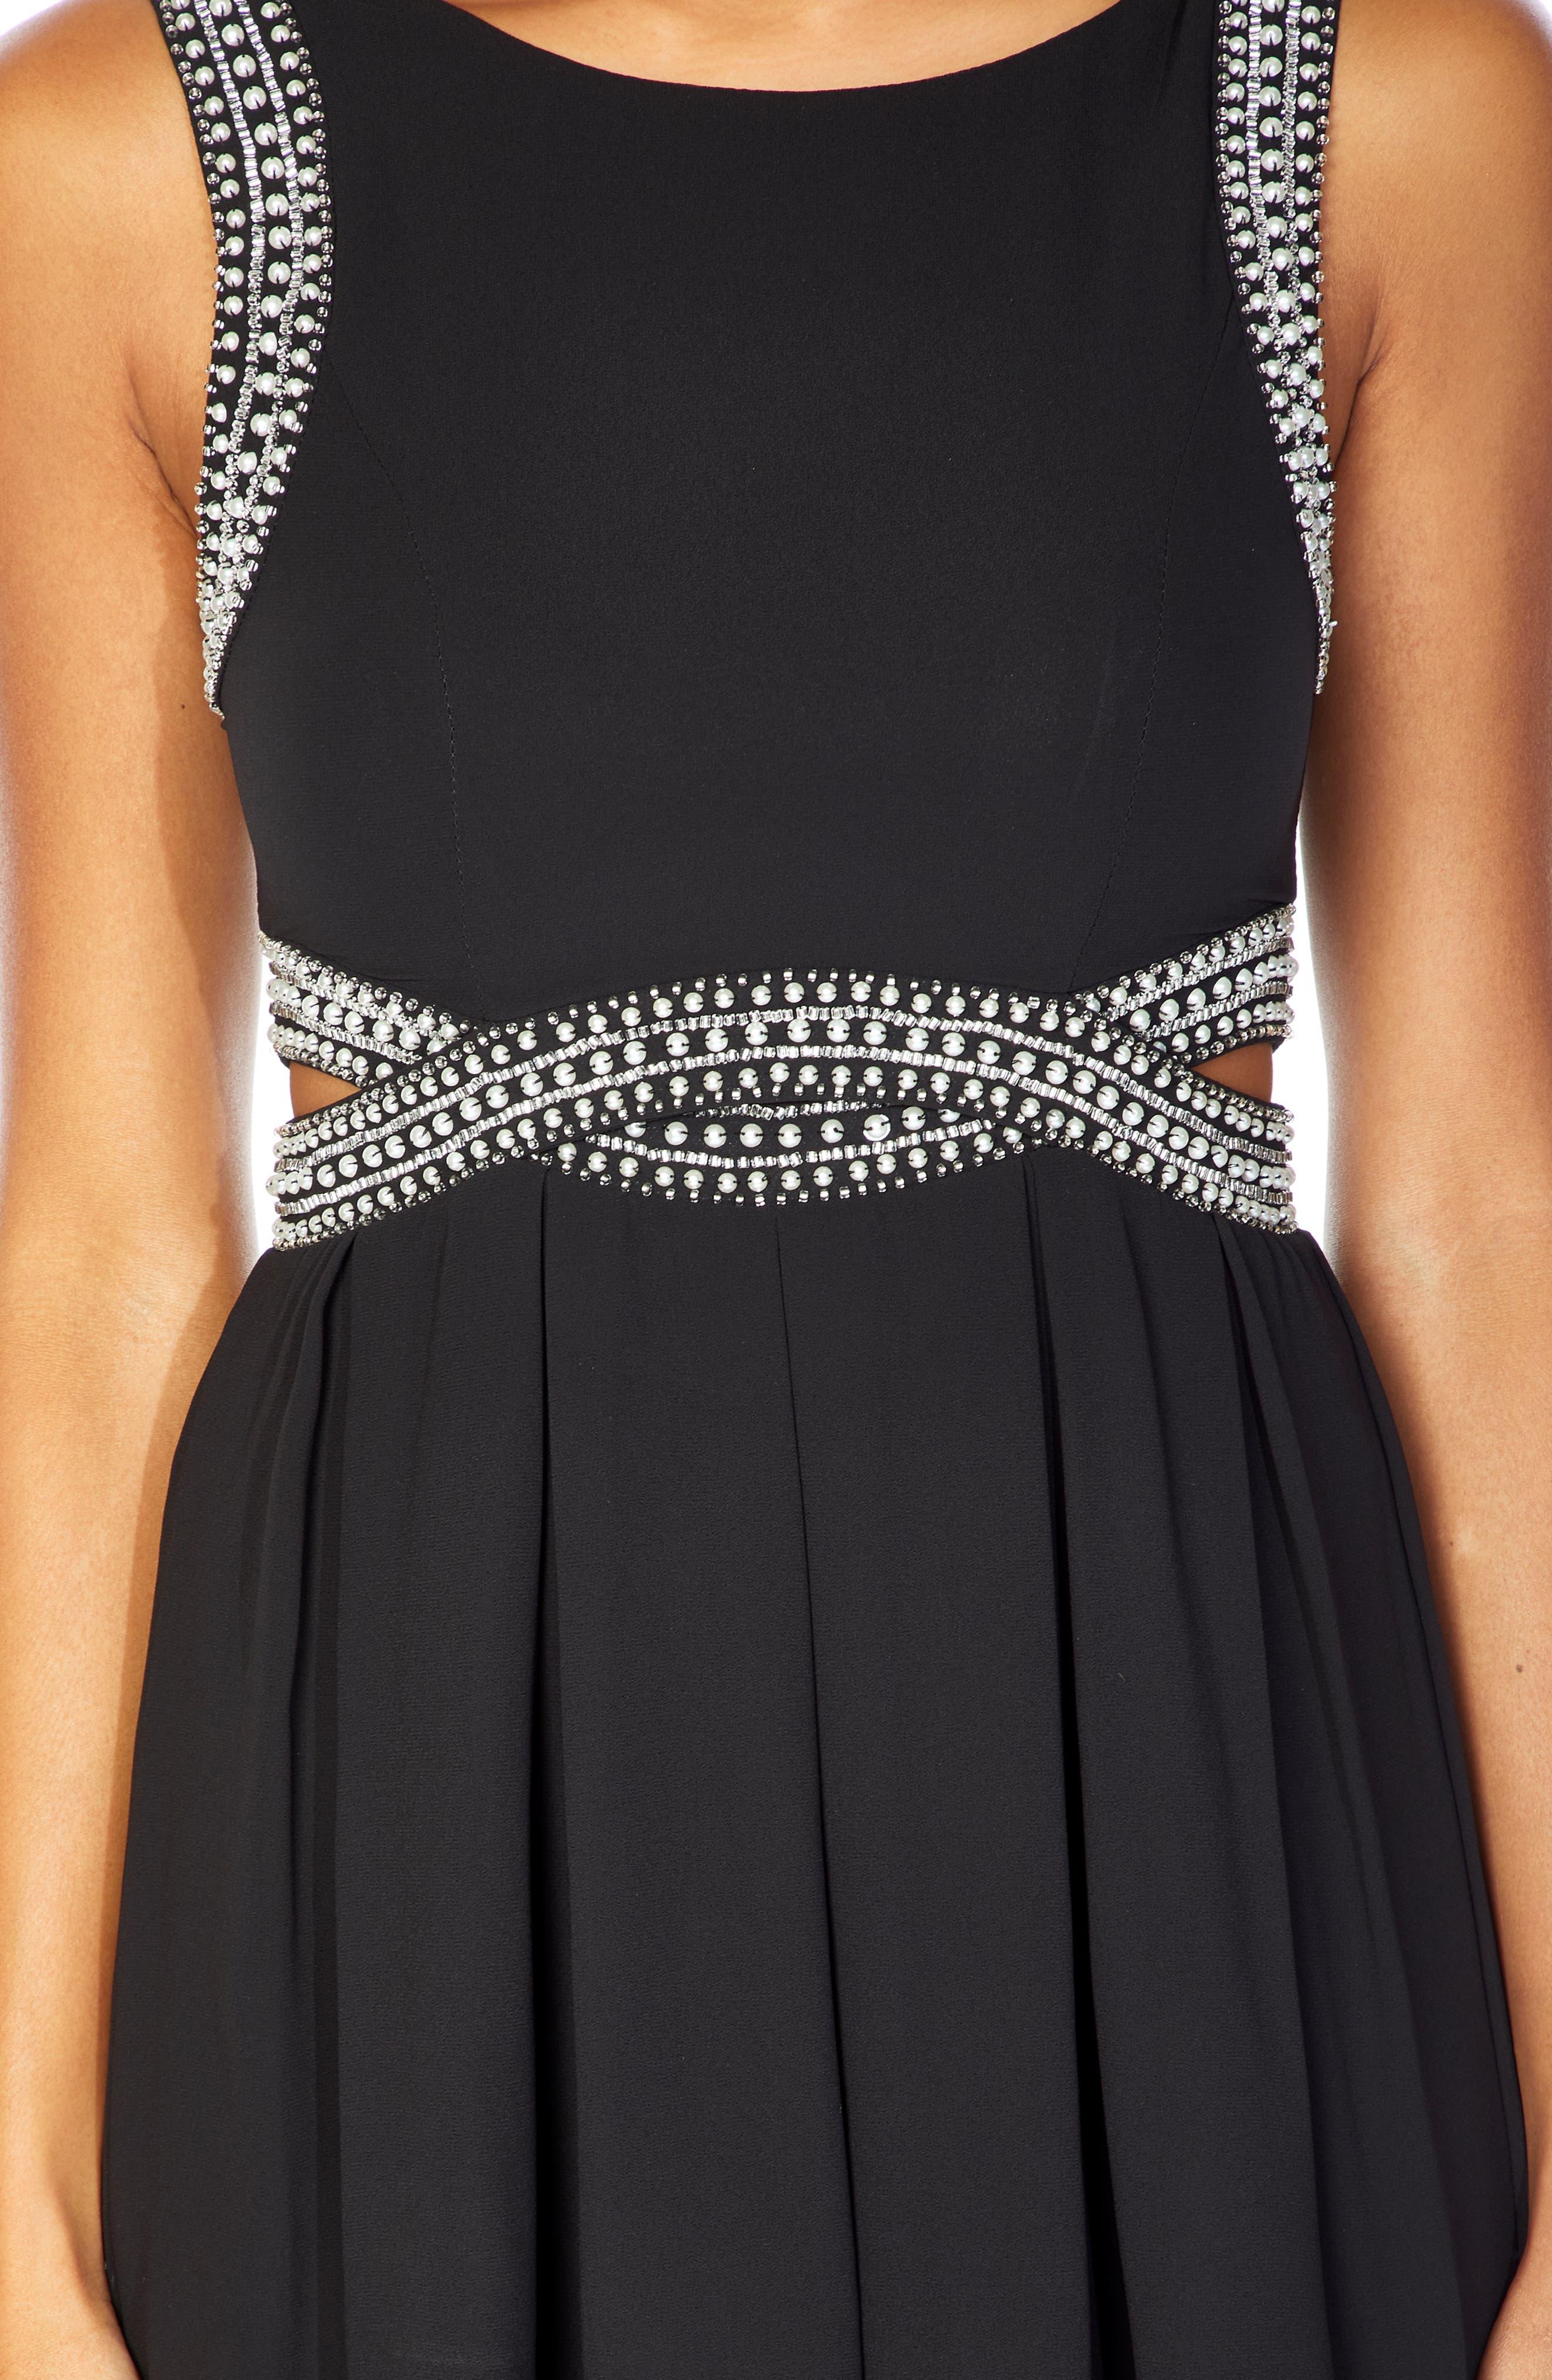 Malaga Beaded Minidress,                             Alternate thumbnail 3, color,                             BLACK